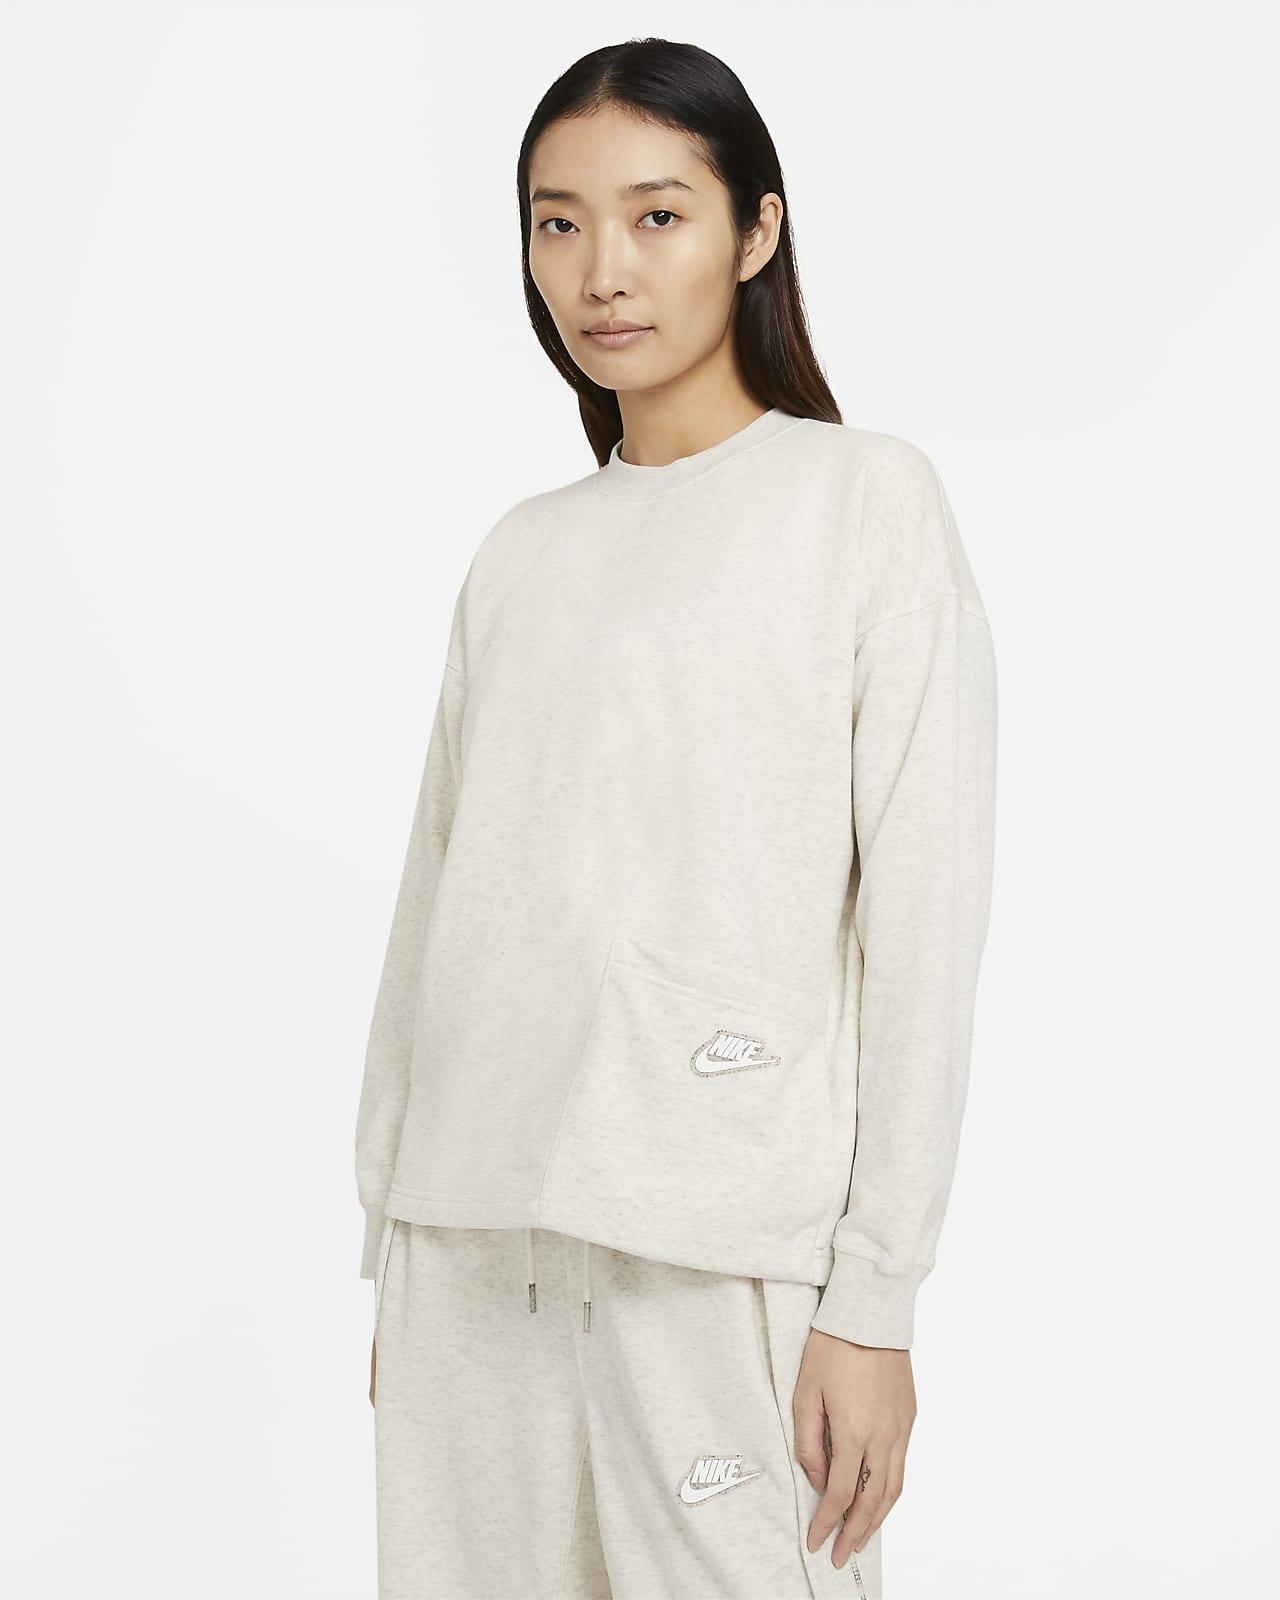 Nike Sportswear 女款圓領上衣